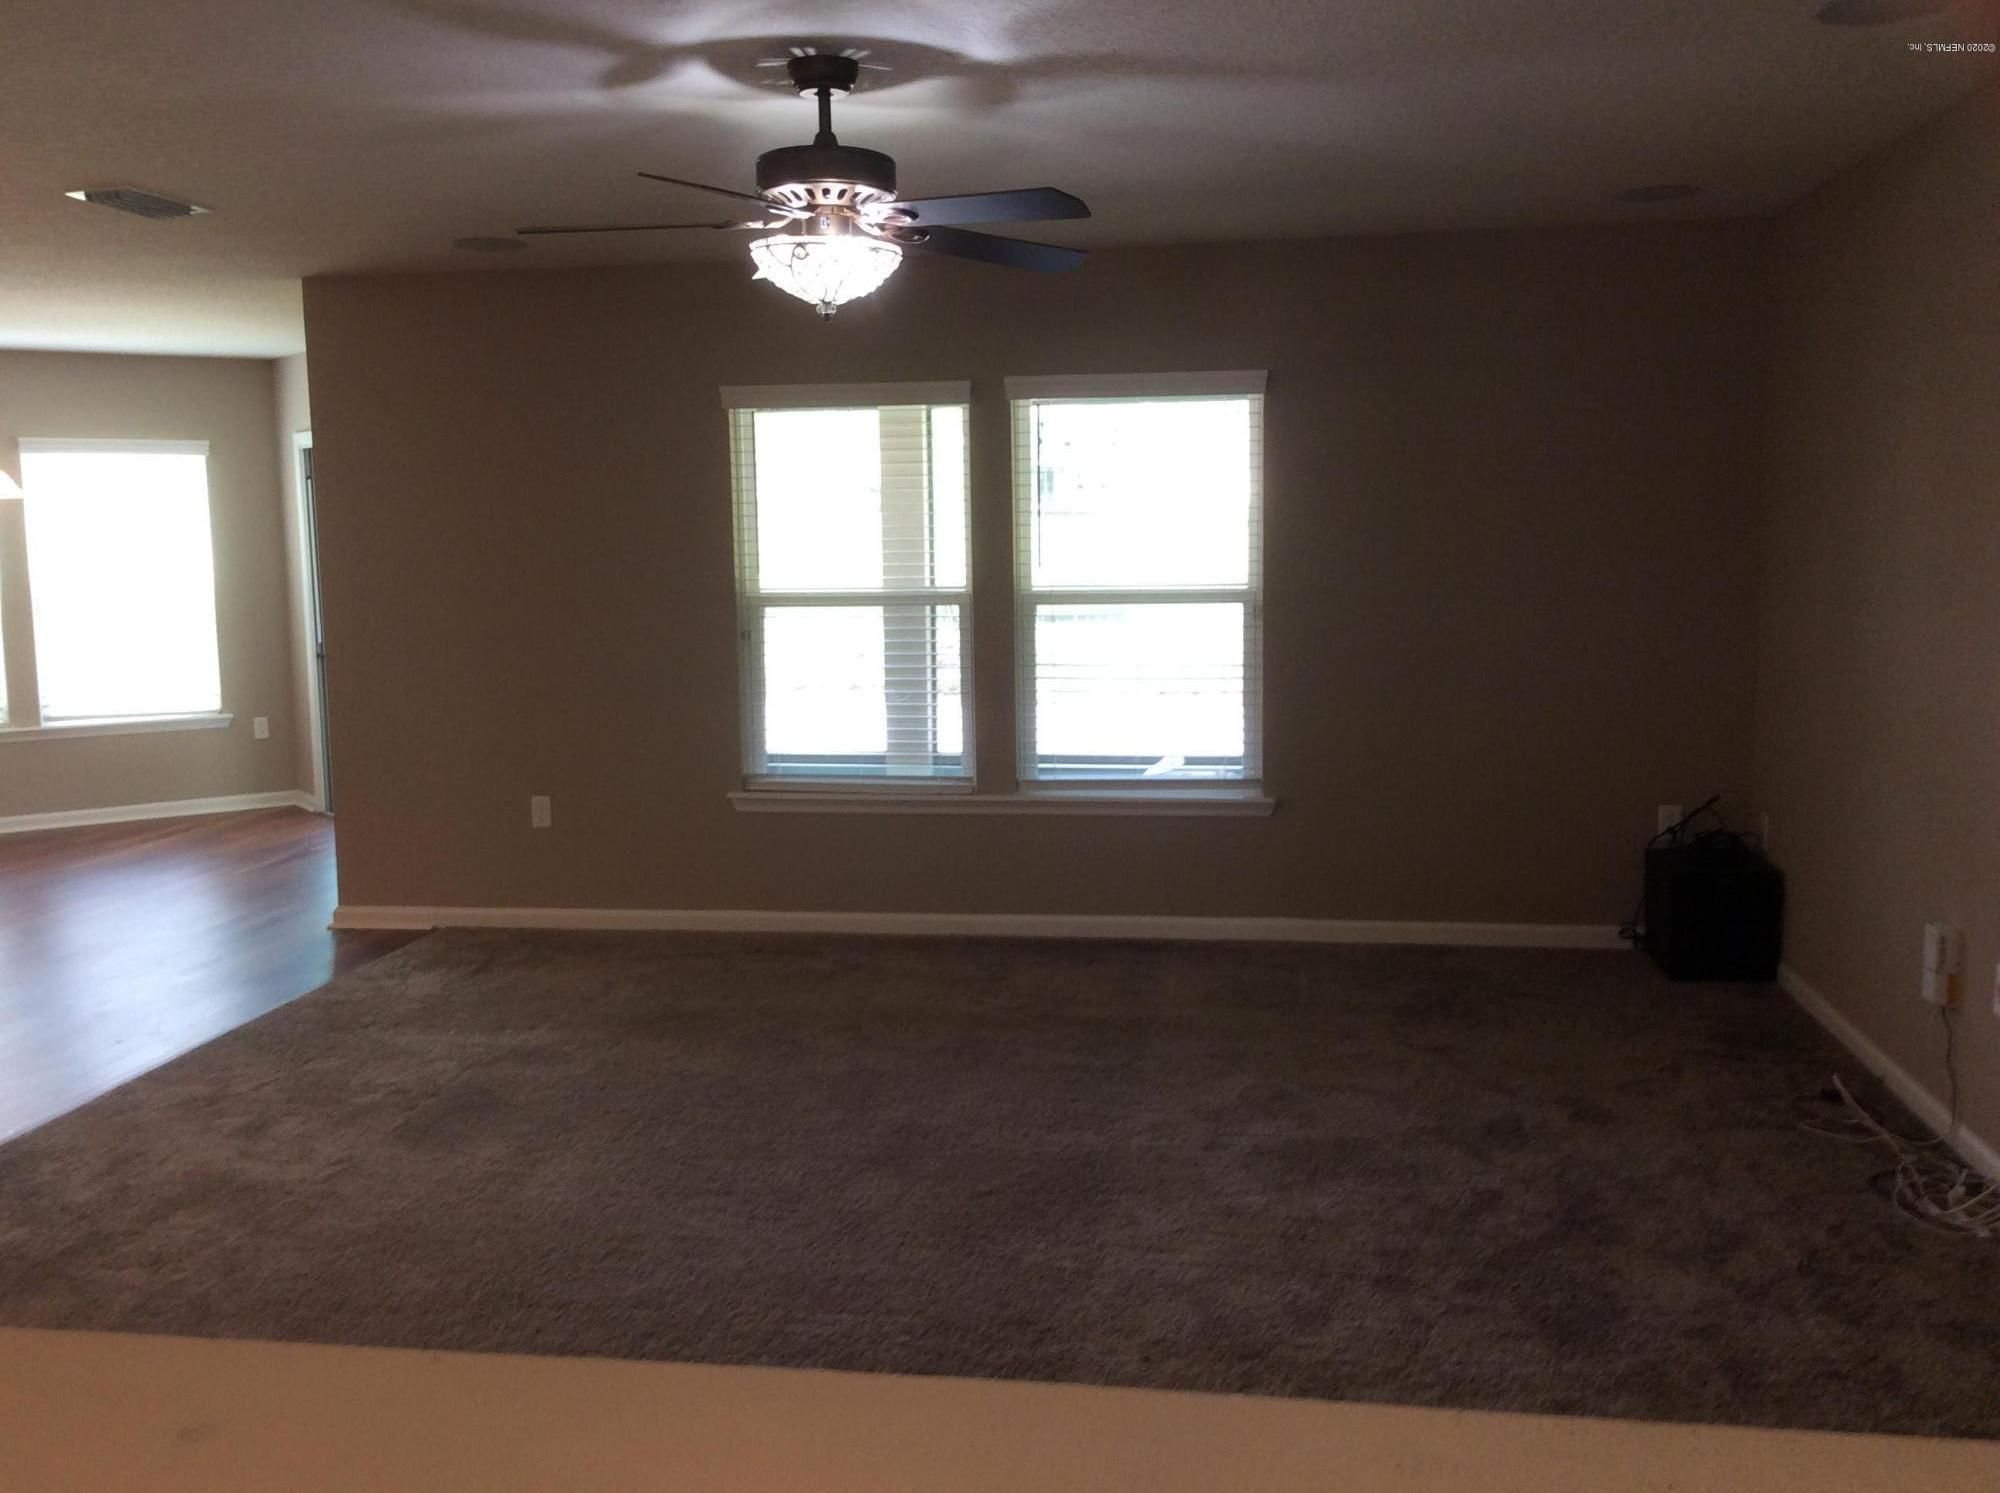 8163 FOURAKER FOREST, JACKSONVILLE, FLORIDA 32221, 4 Bedrooms Bedrooms, ,2 BathroomsBathrooms,Residential,For sale,FOURAKER FOREST,1047663